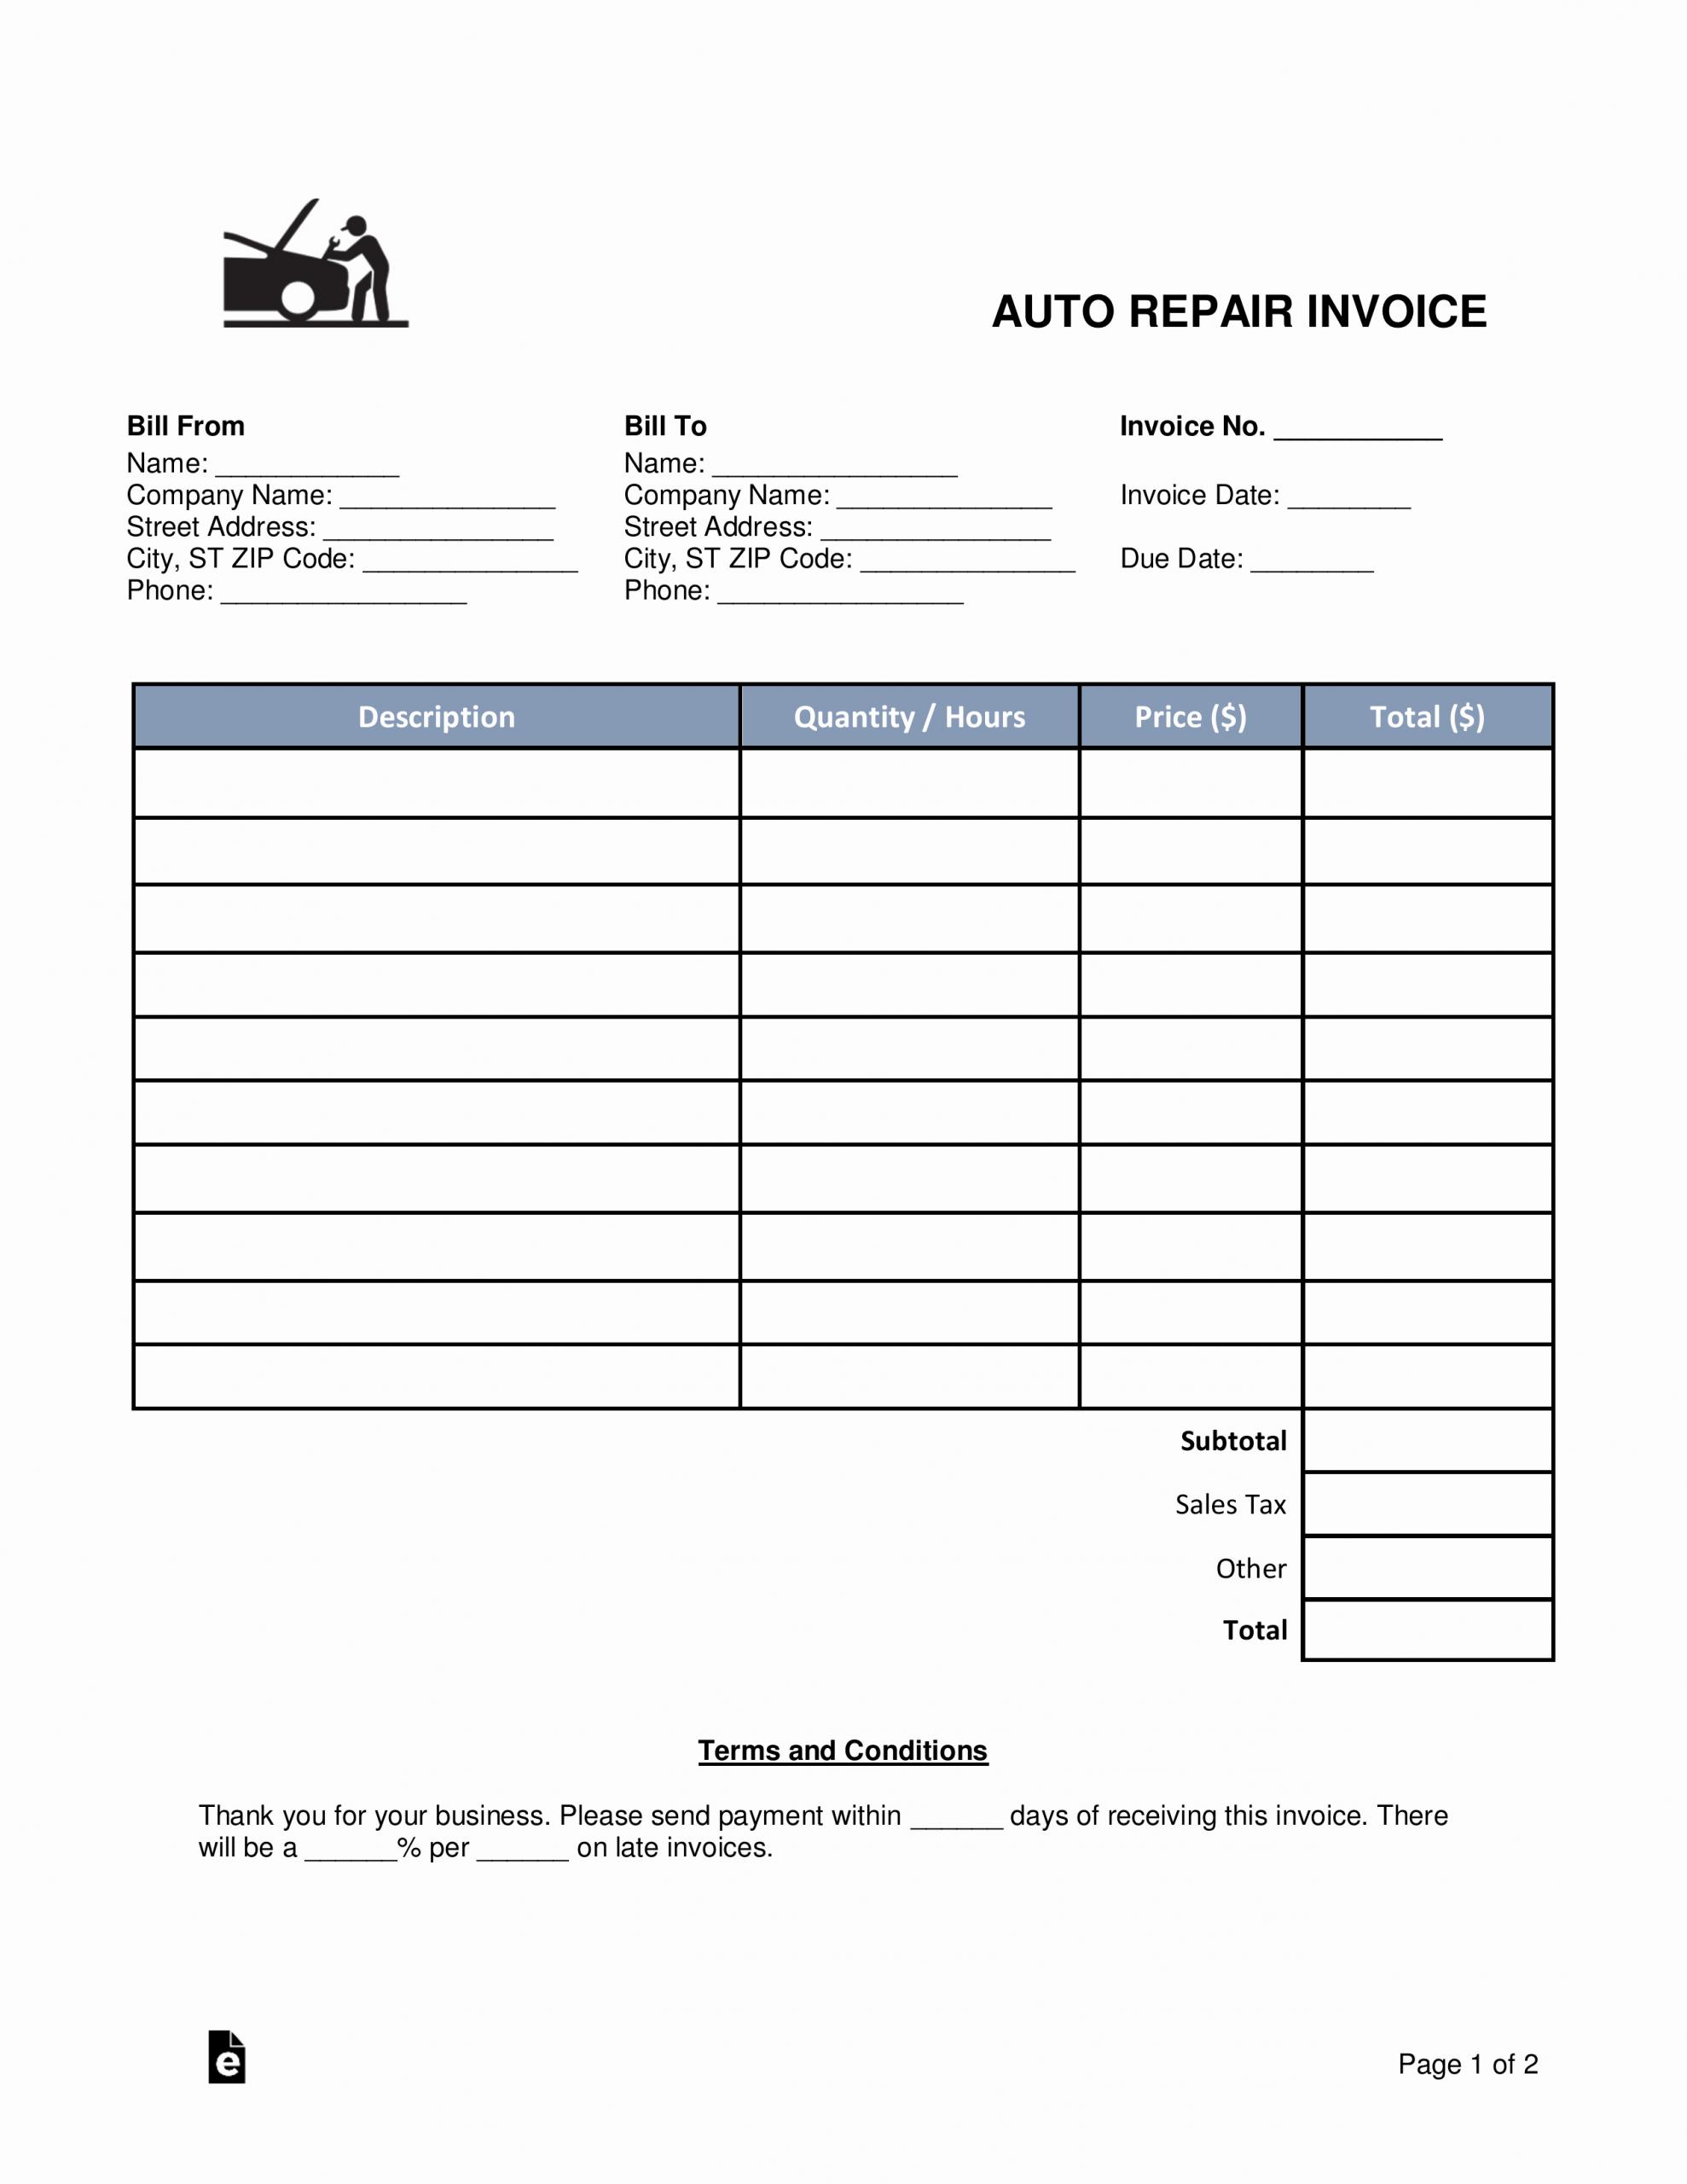 Auto Body Shop Invoice Template Luxury Free Auto Body Mechanic Invoice Template Word